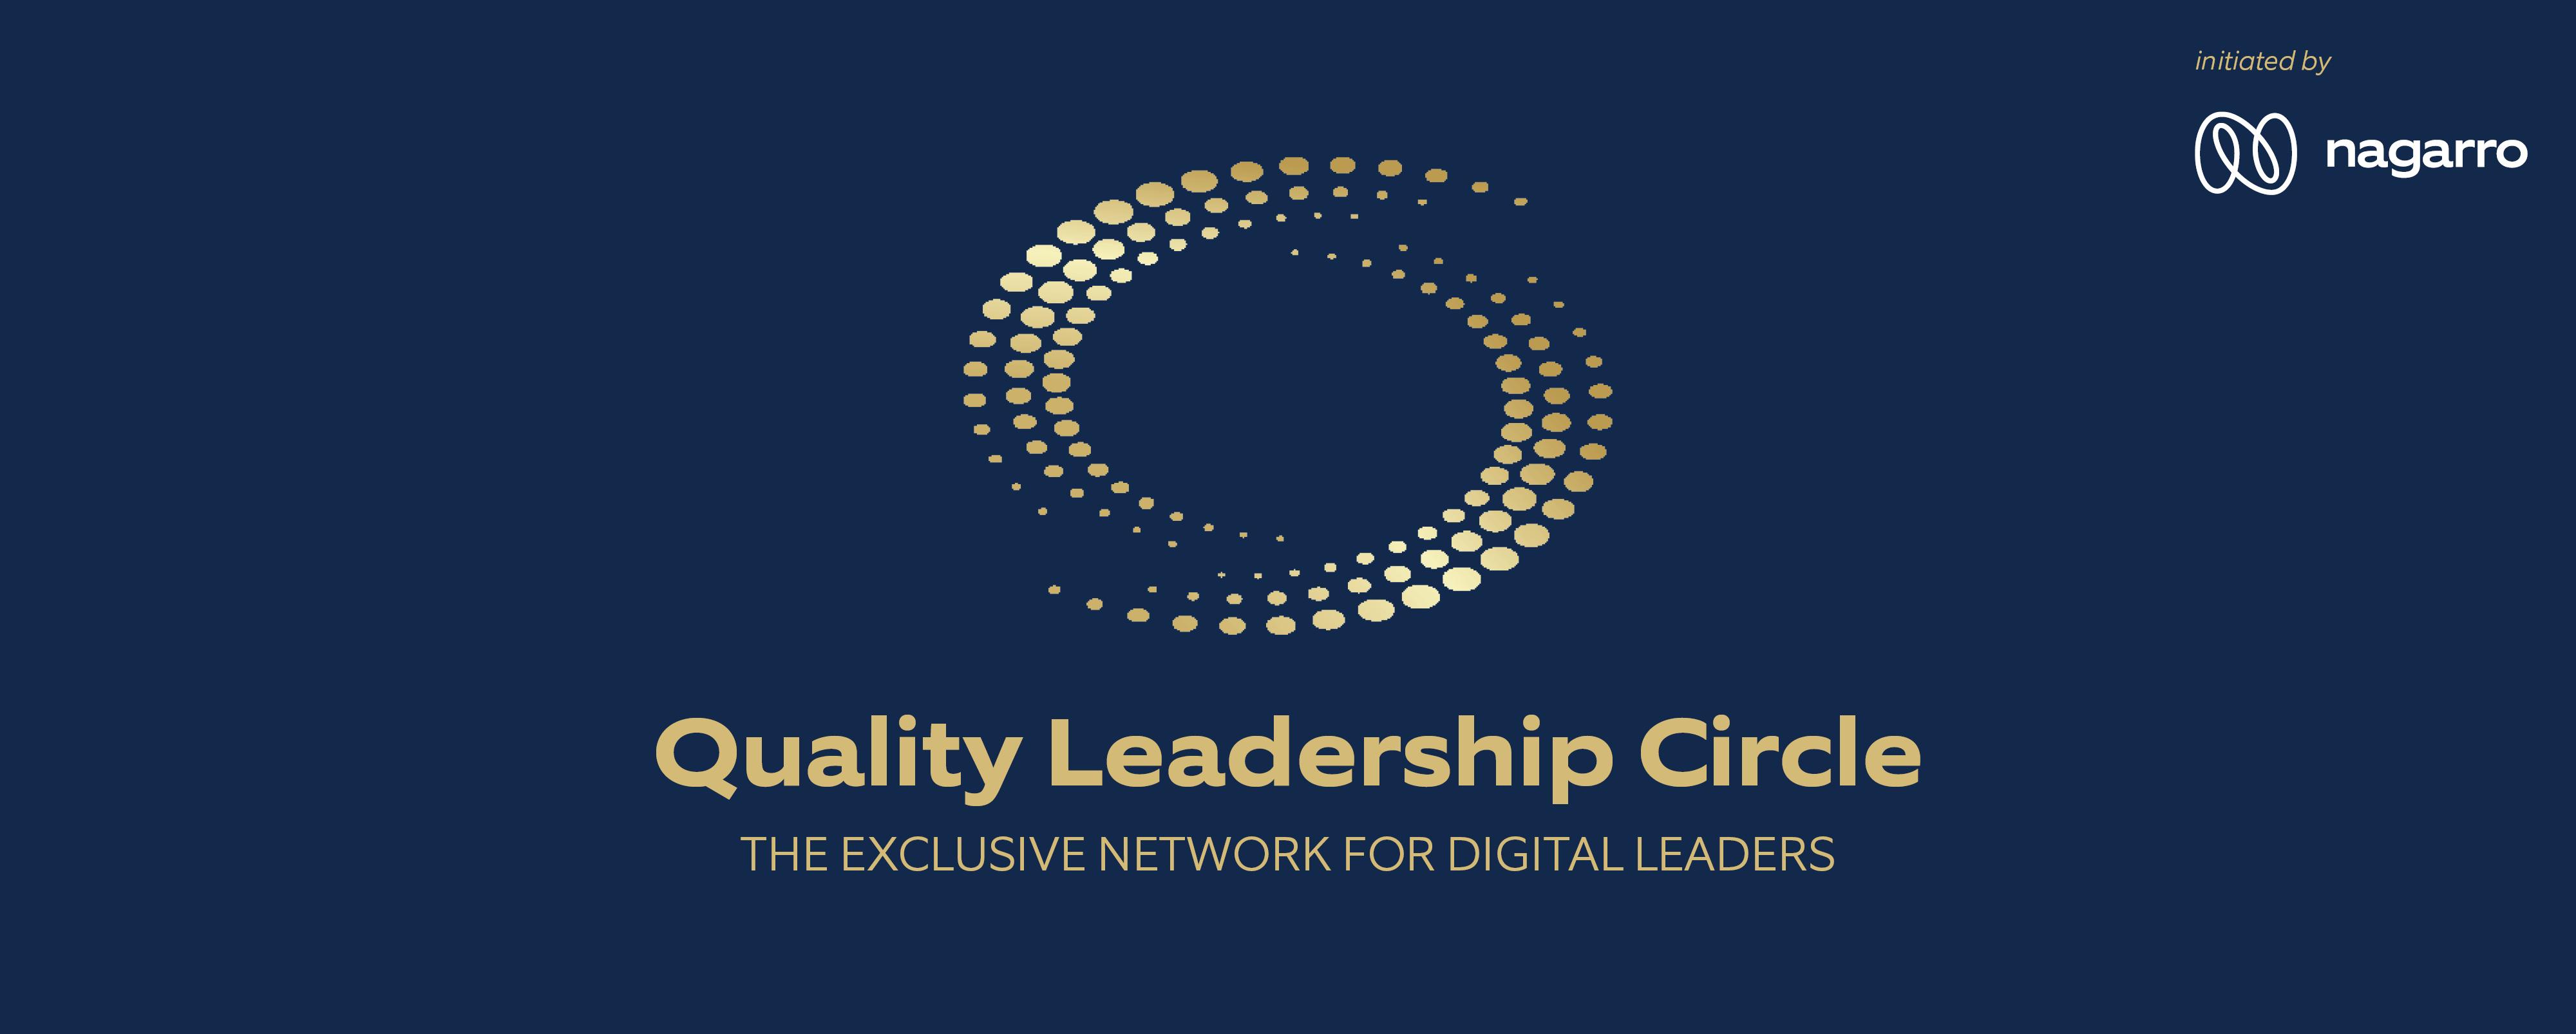 Quality Leadership Cirle_Header_LP